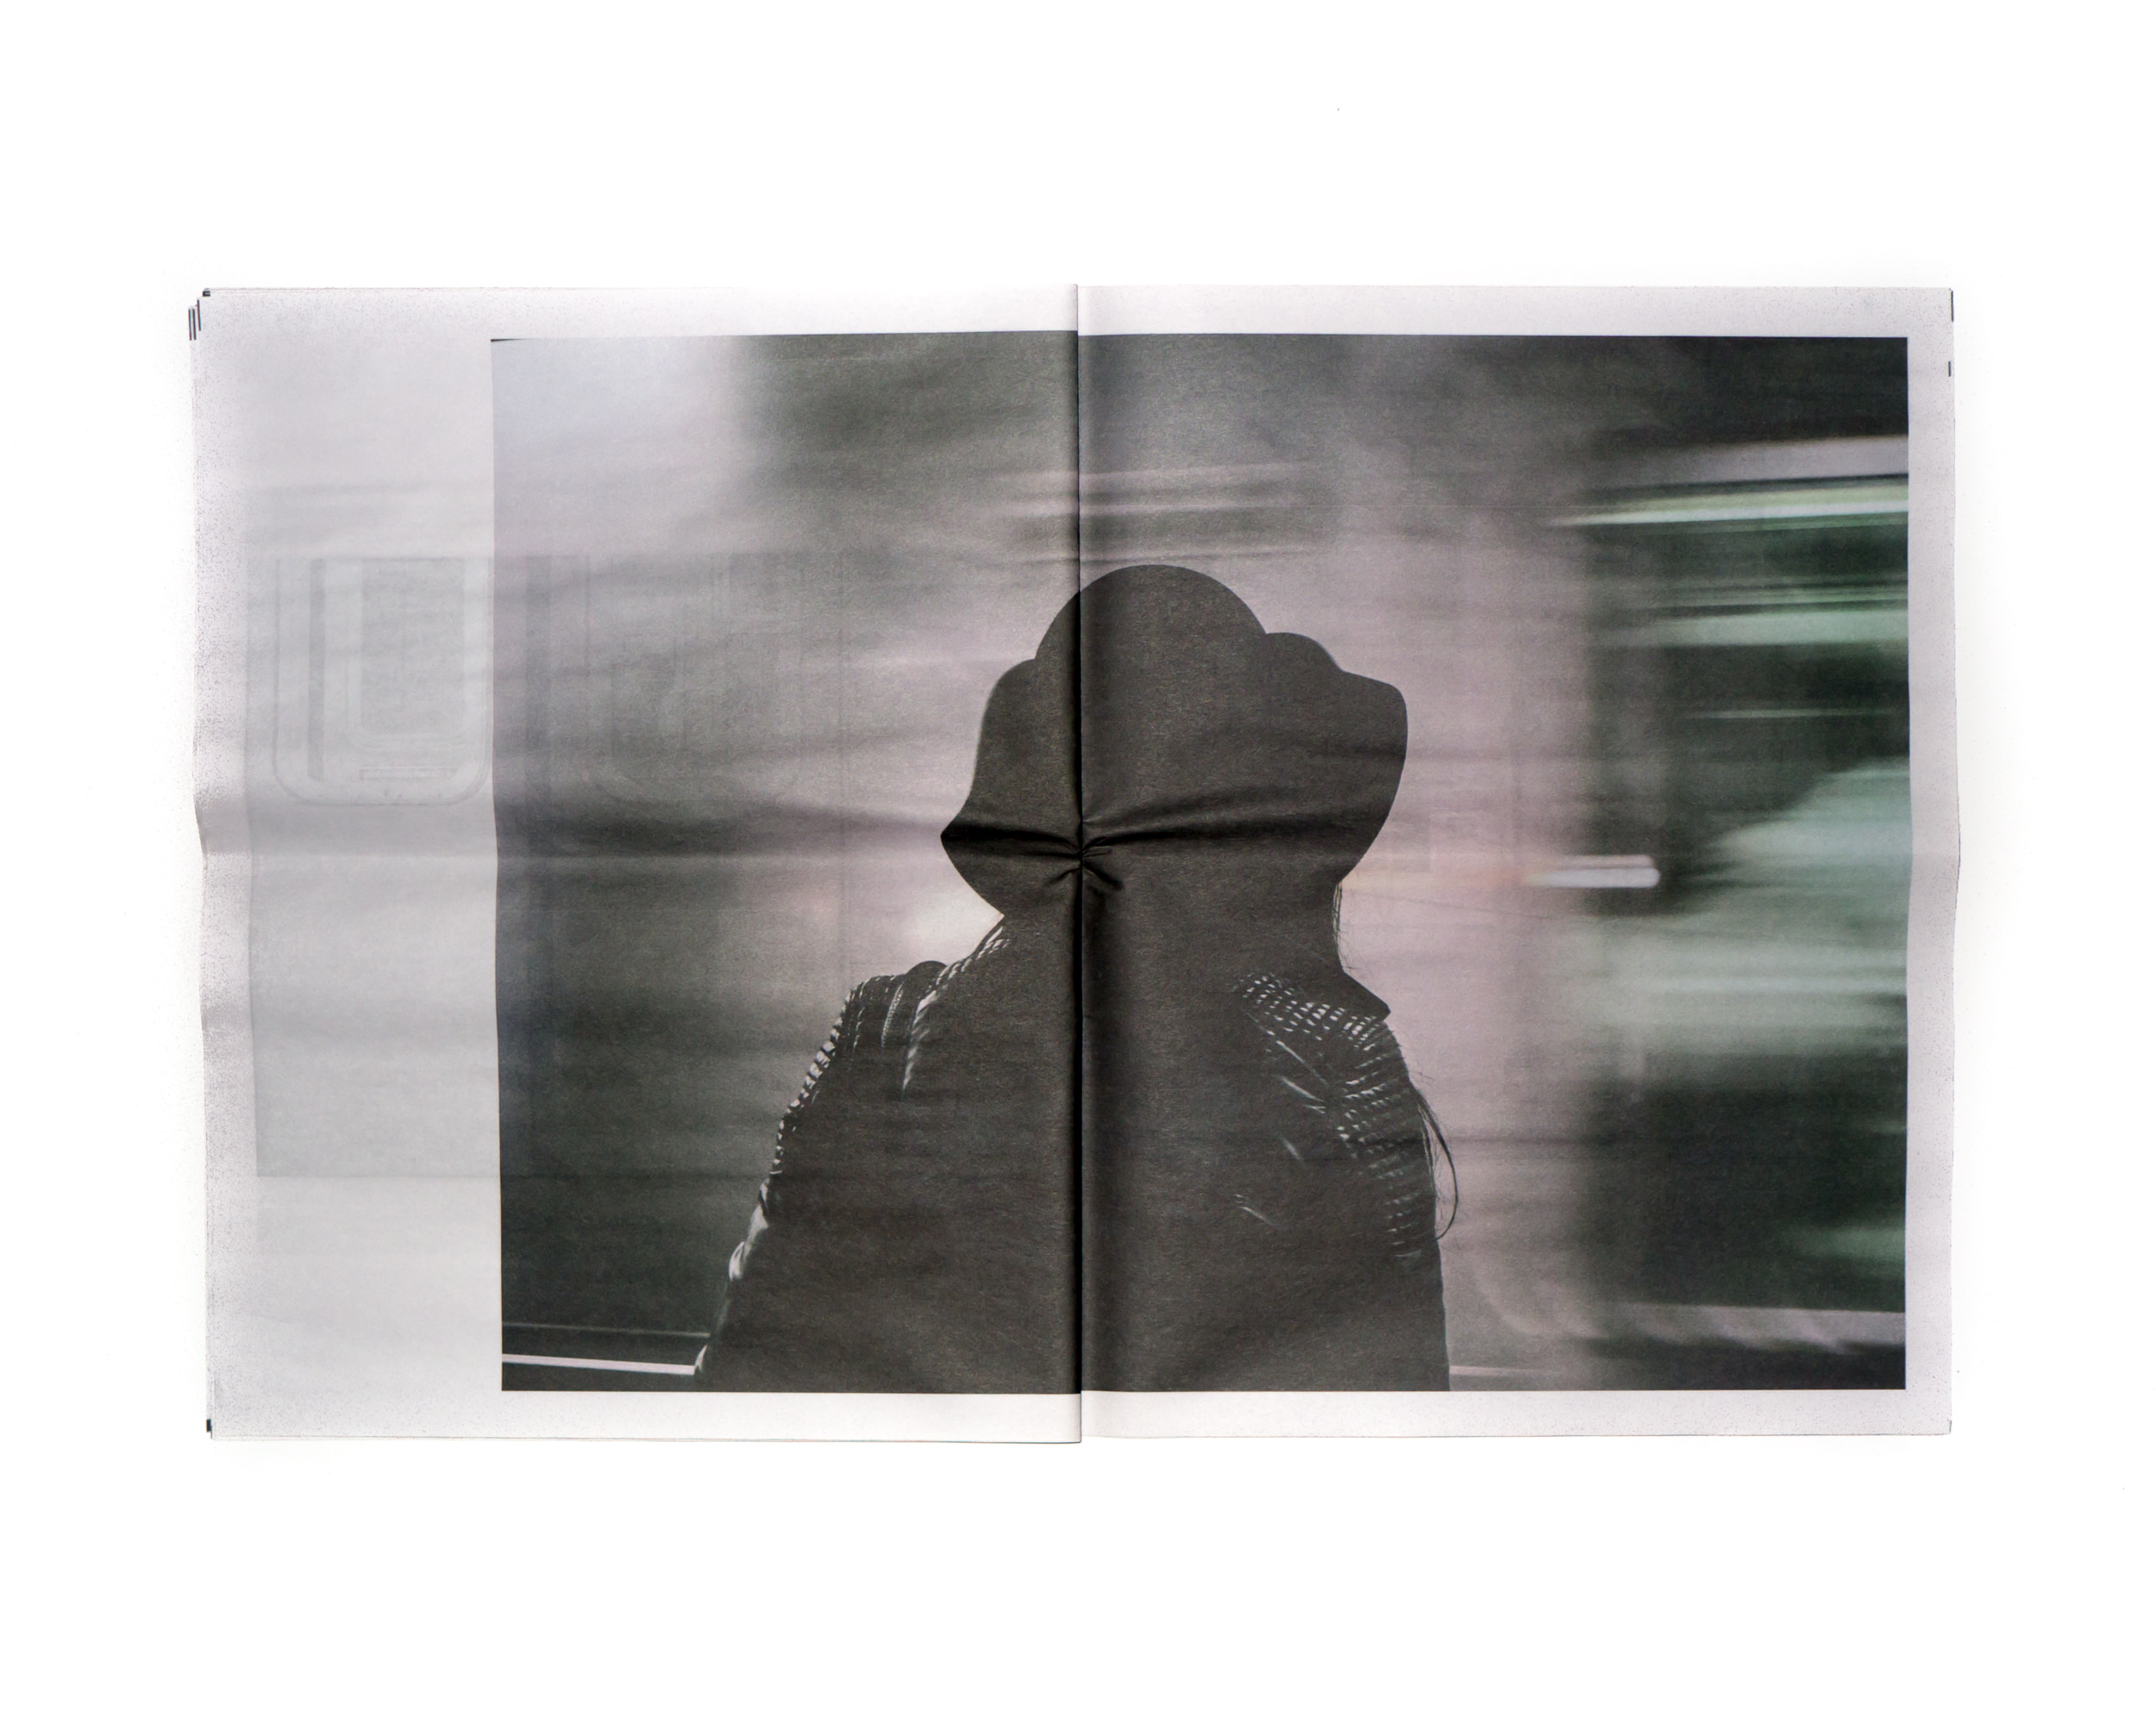 grit-street-01-newsprint-promo-6.jpg